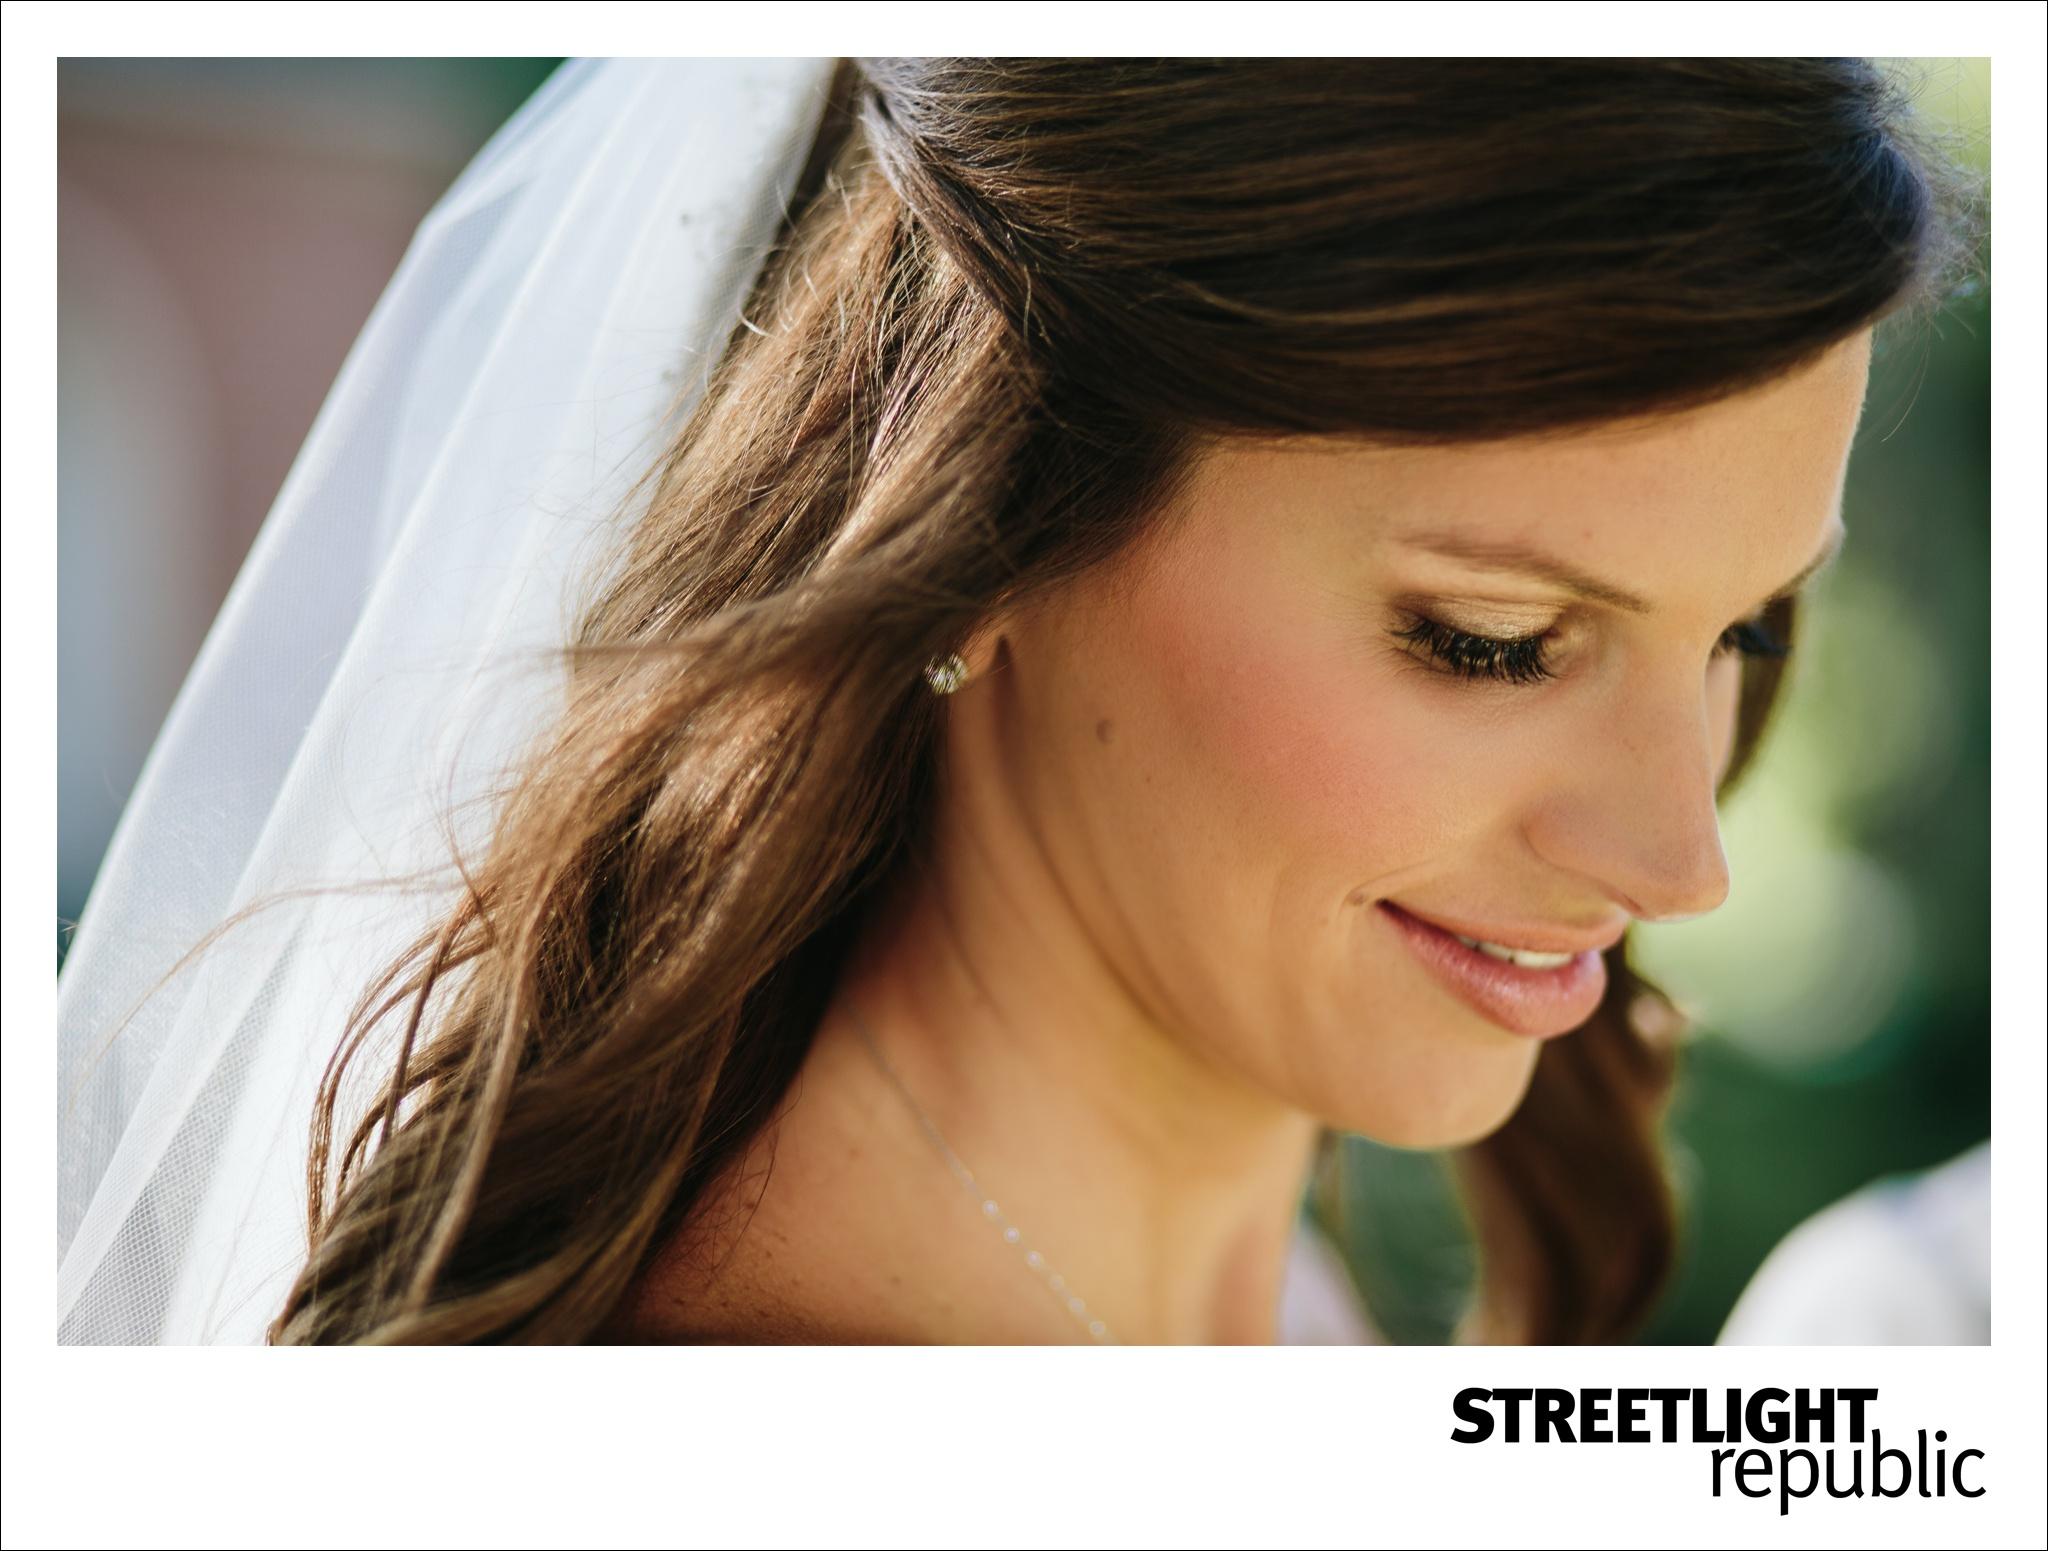 Nashville Wedding Photographers Streetlight Republic, Christ the King Church, Green Hills Wedding